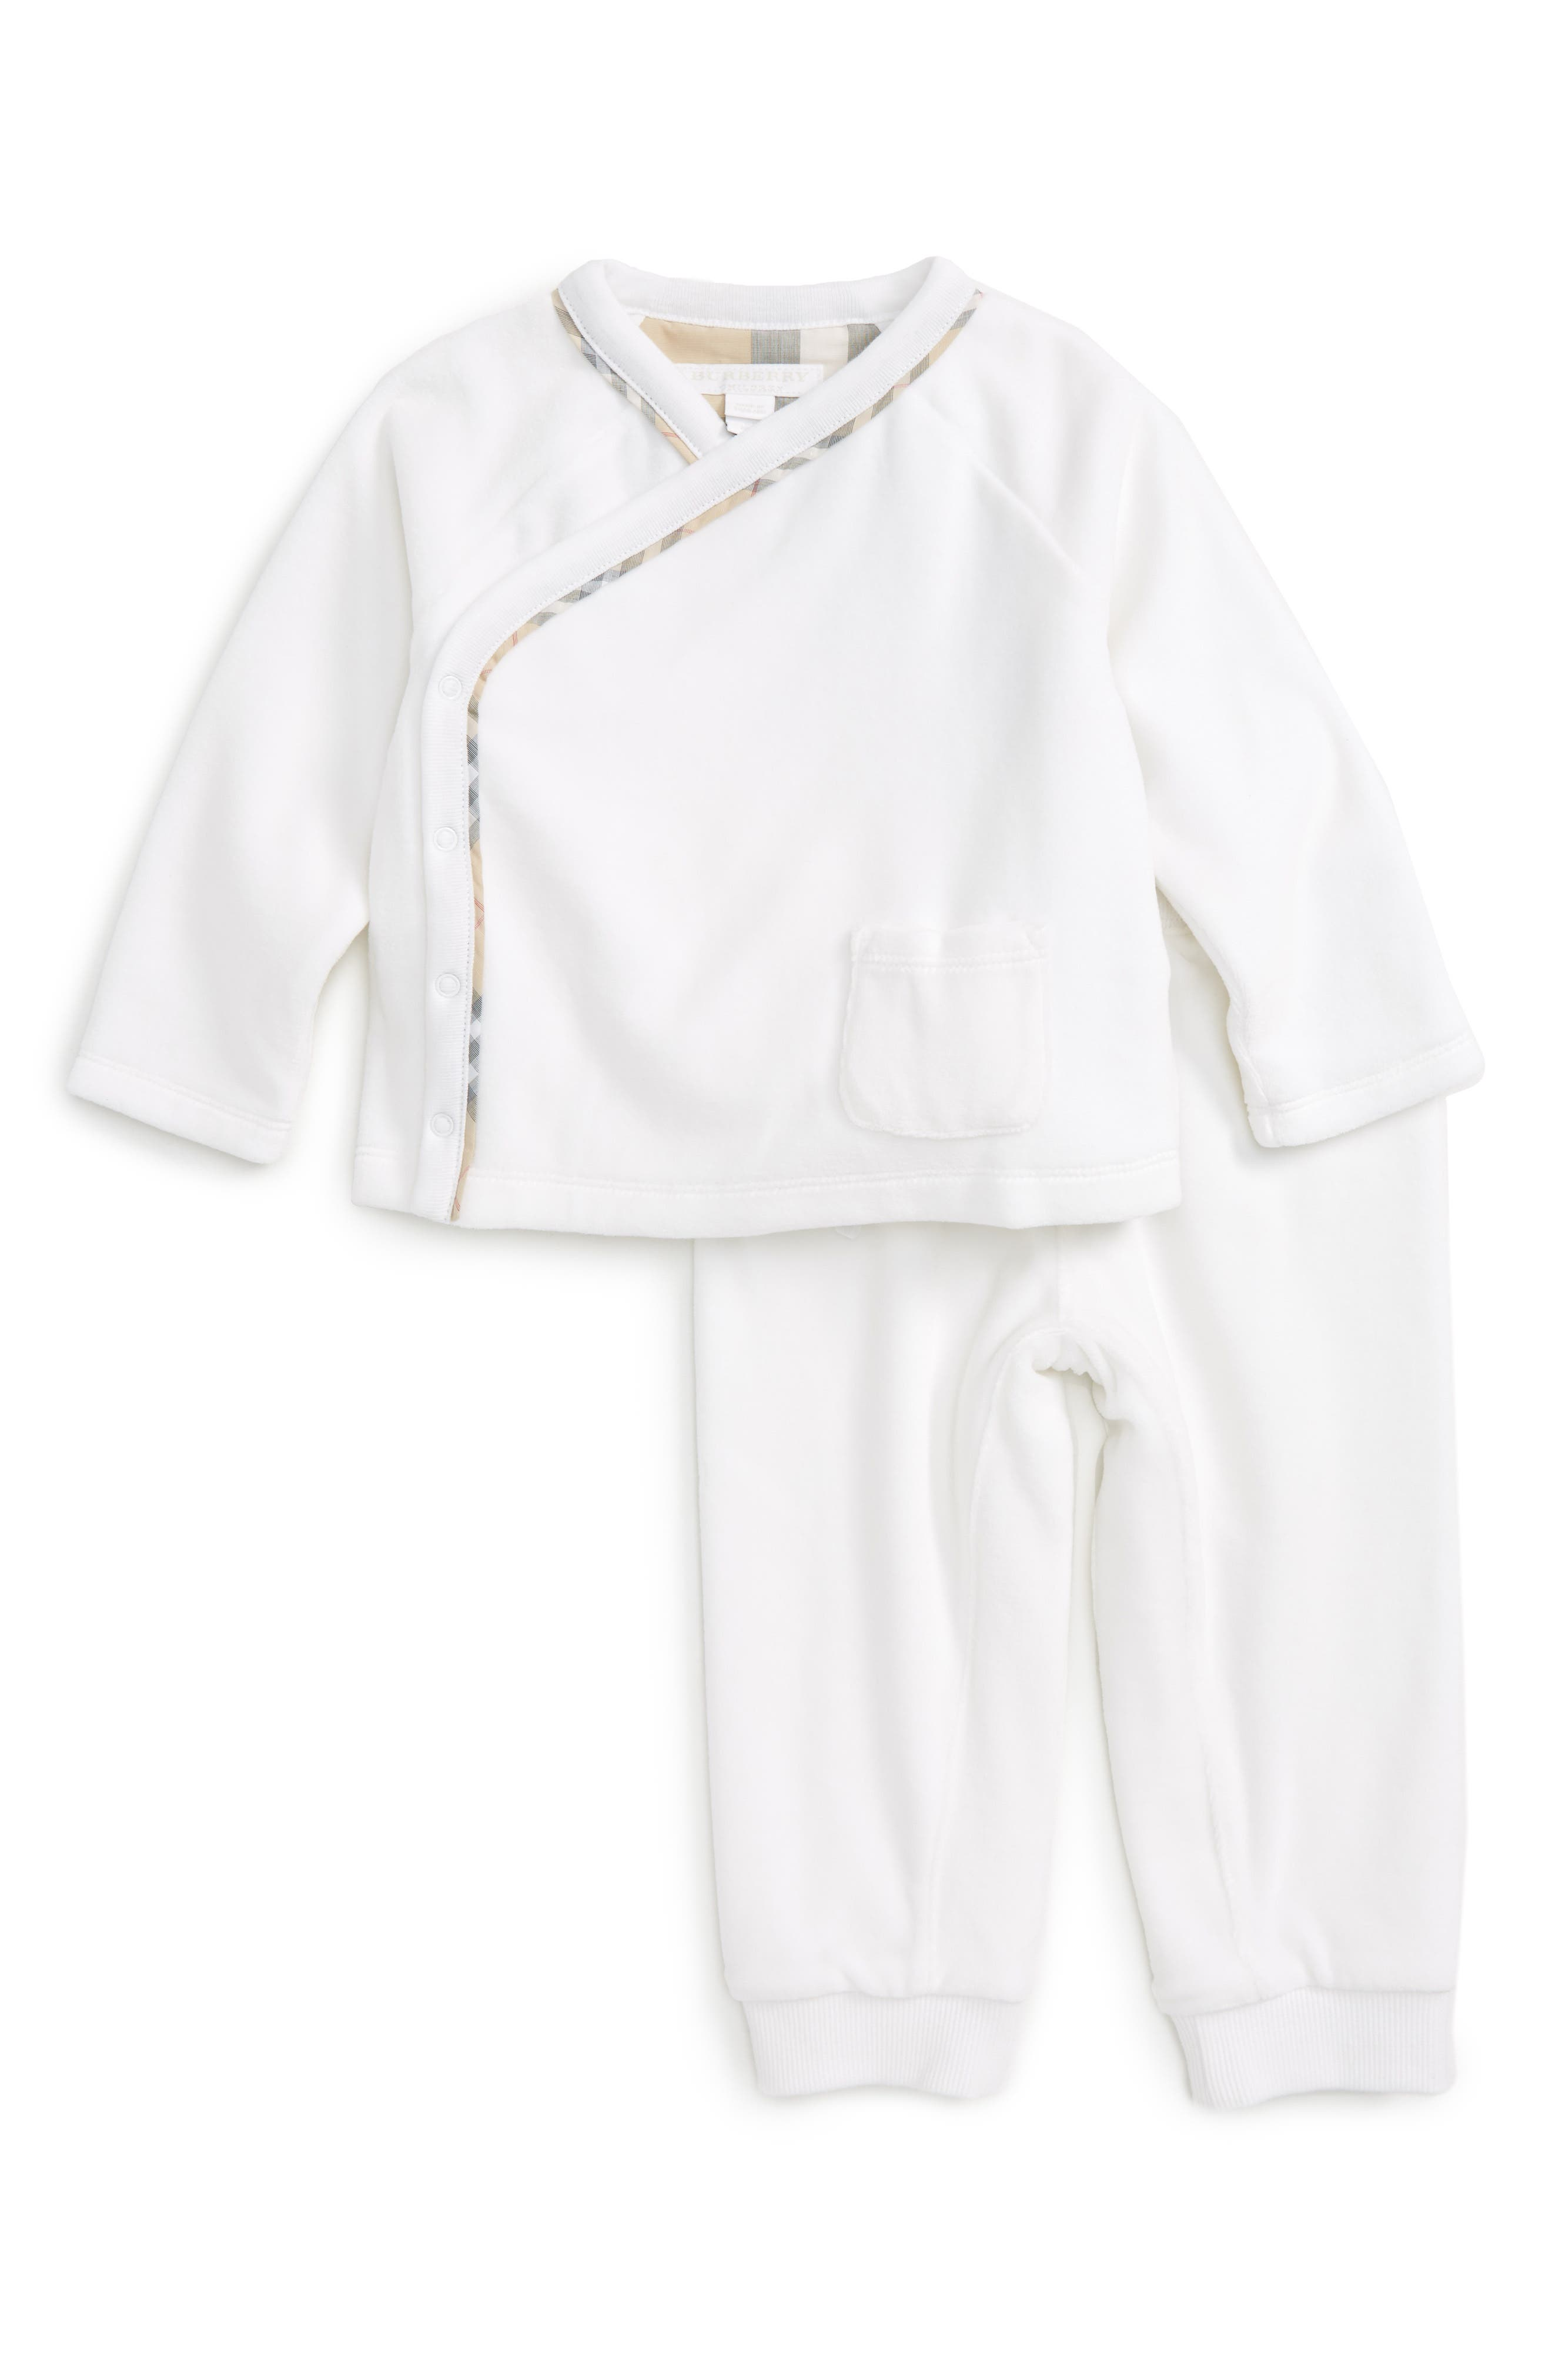 Remy Shirt & Pants Set,                             Main thumbnail 1, color,                             White